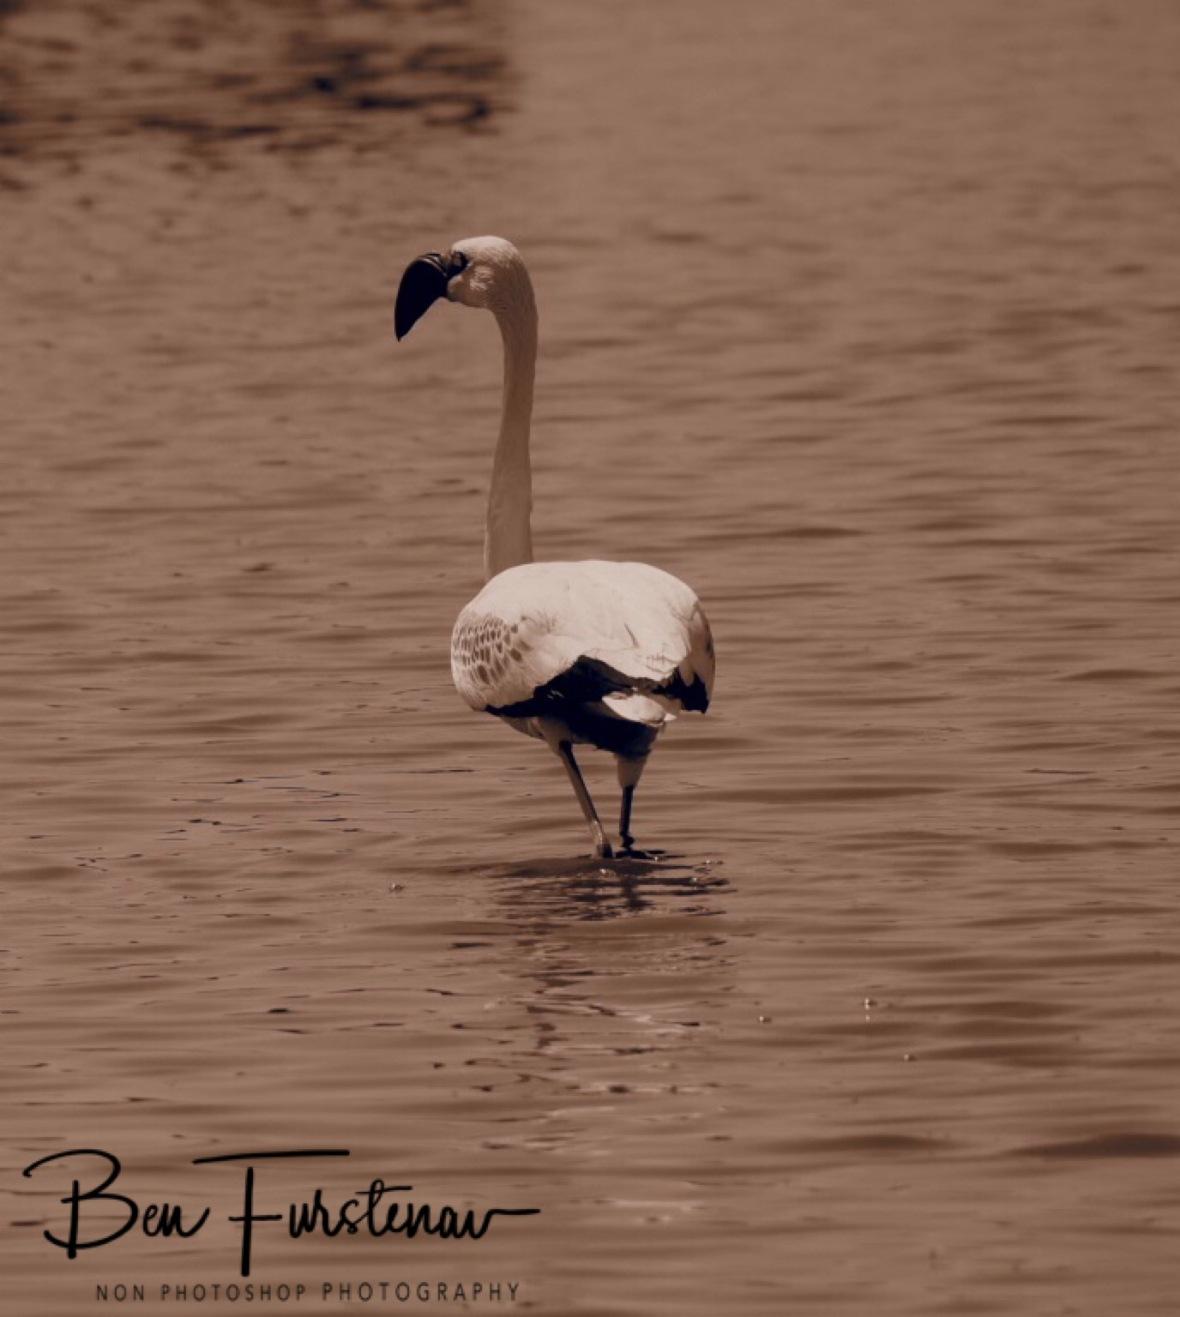 OM-D, a flamingo, Makgadikgadi Salt Pans, Botswana